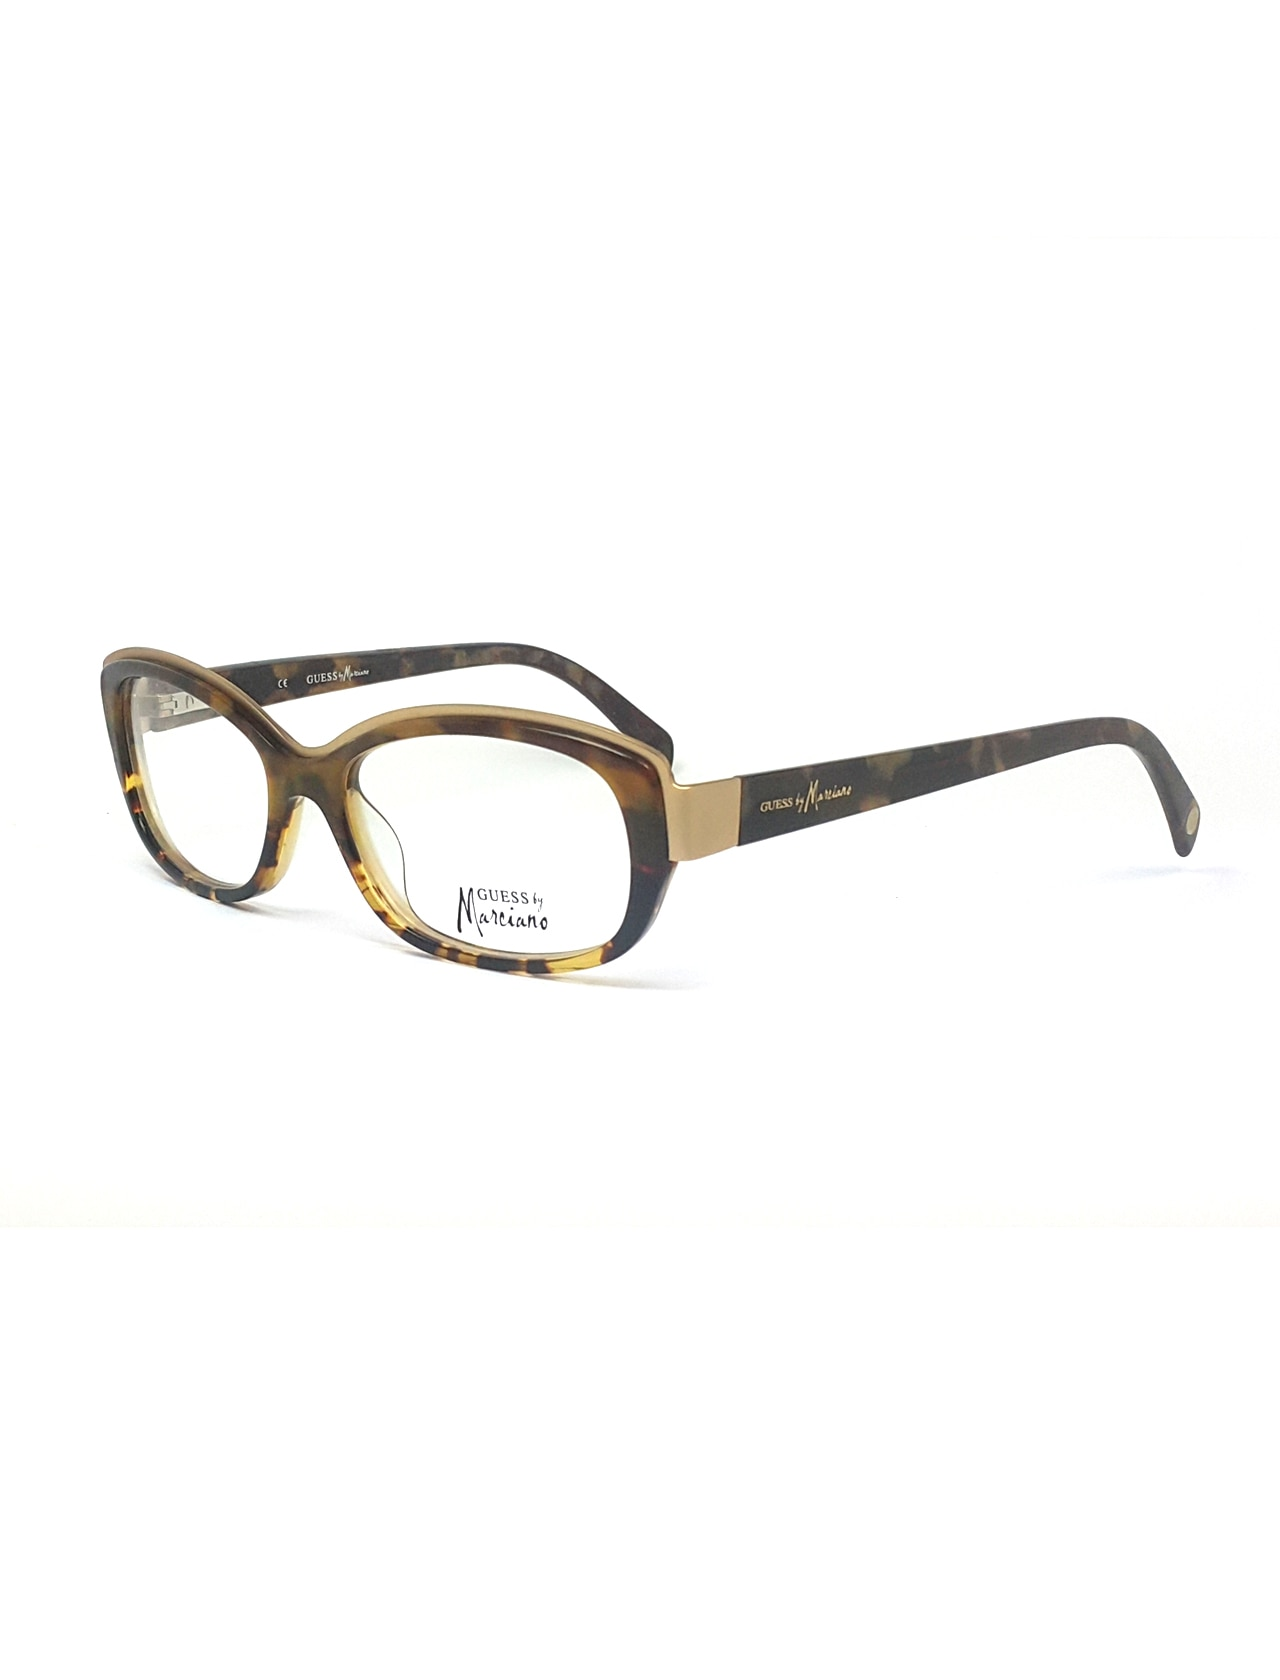 Markamilla Women Reading Glasses Frame Demo Glasses Eyewear Transparent High Quality WomenGuess Marcaino By GM 182 BRN